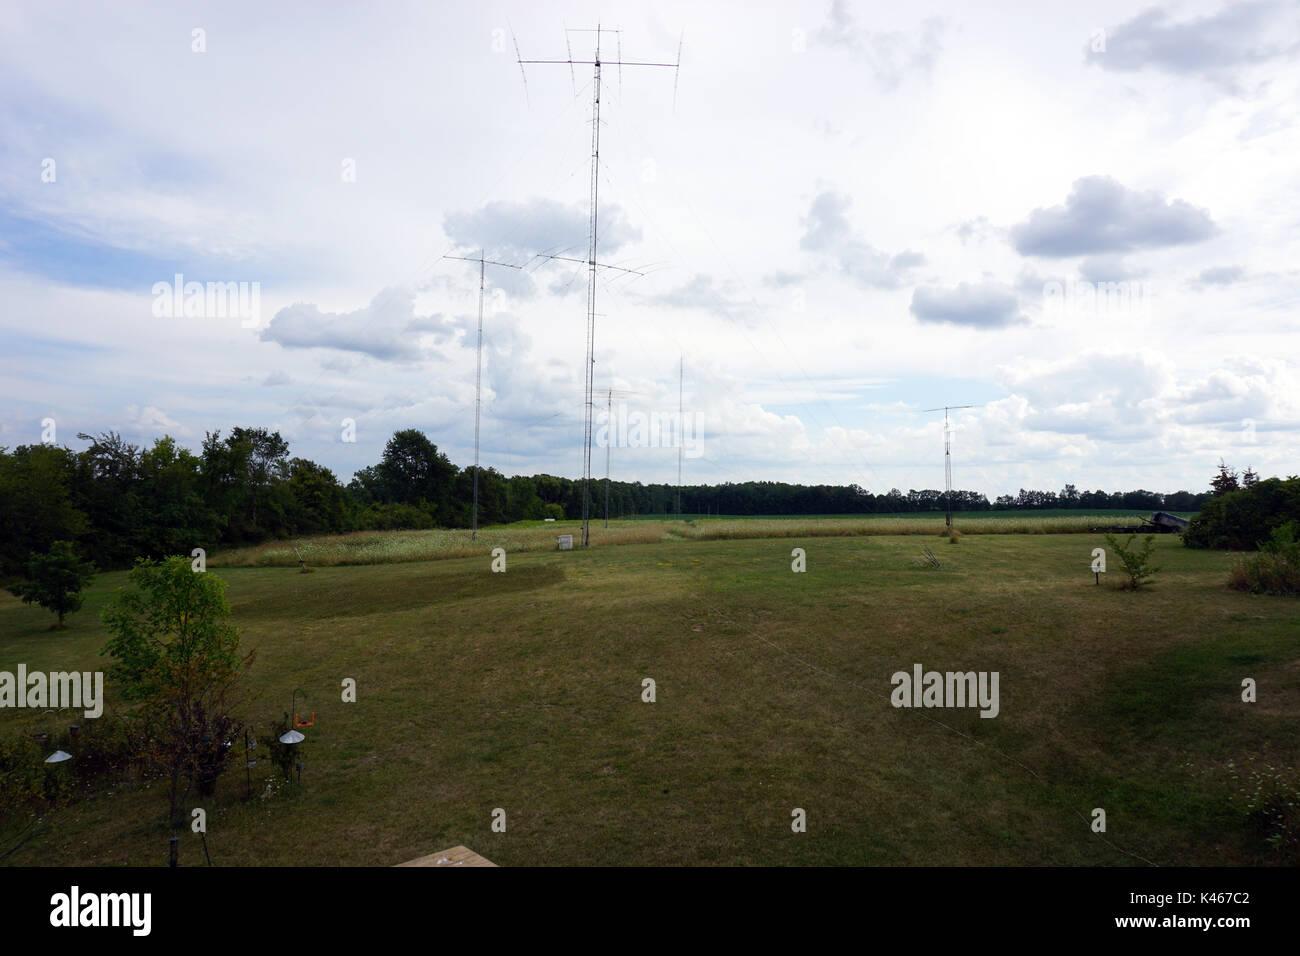 Amateur antenna tower installers sandy oregon